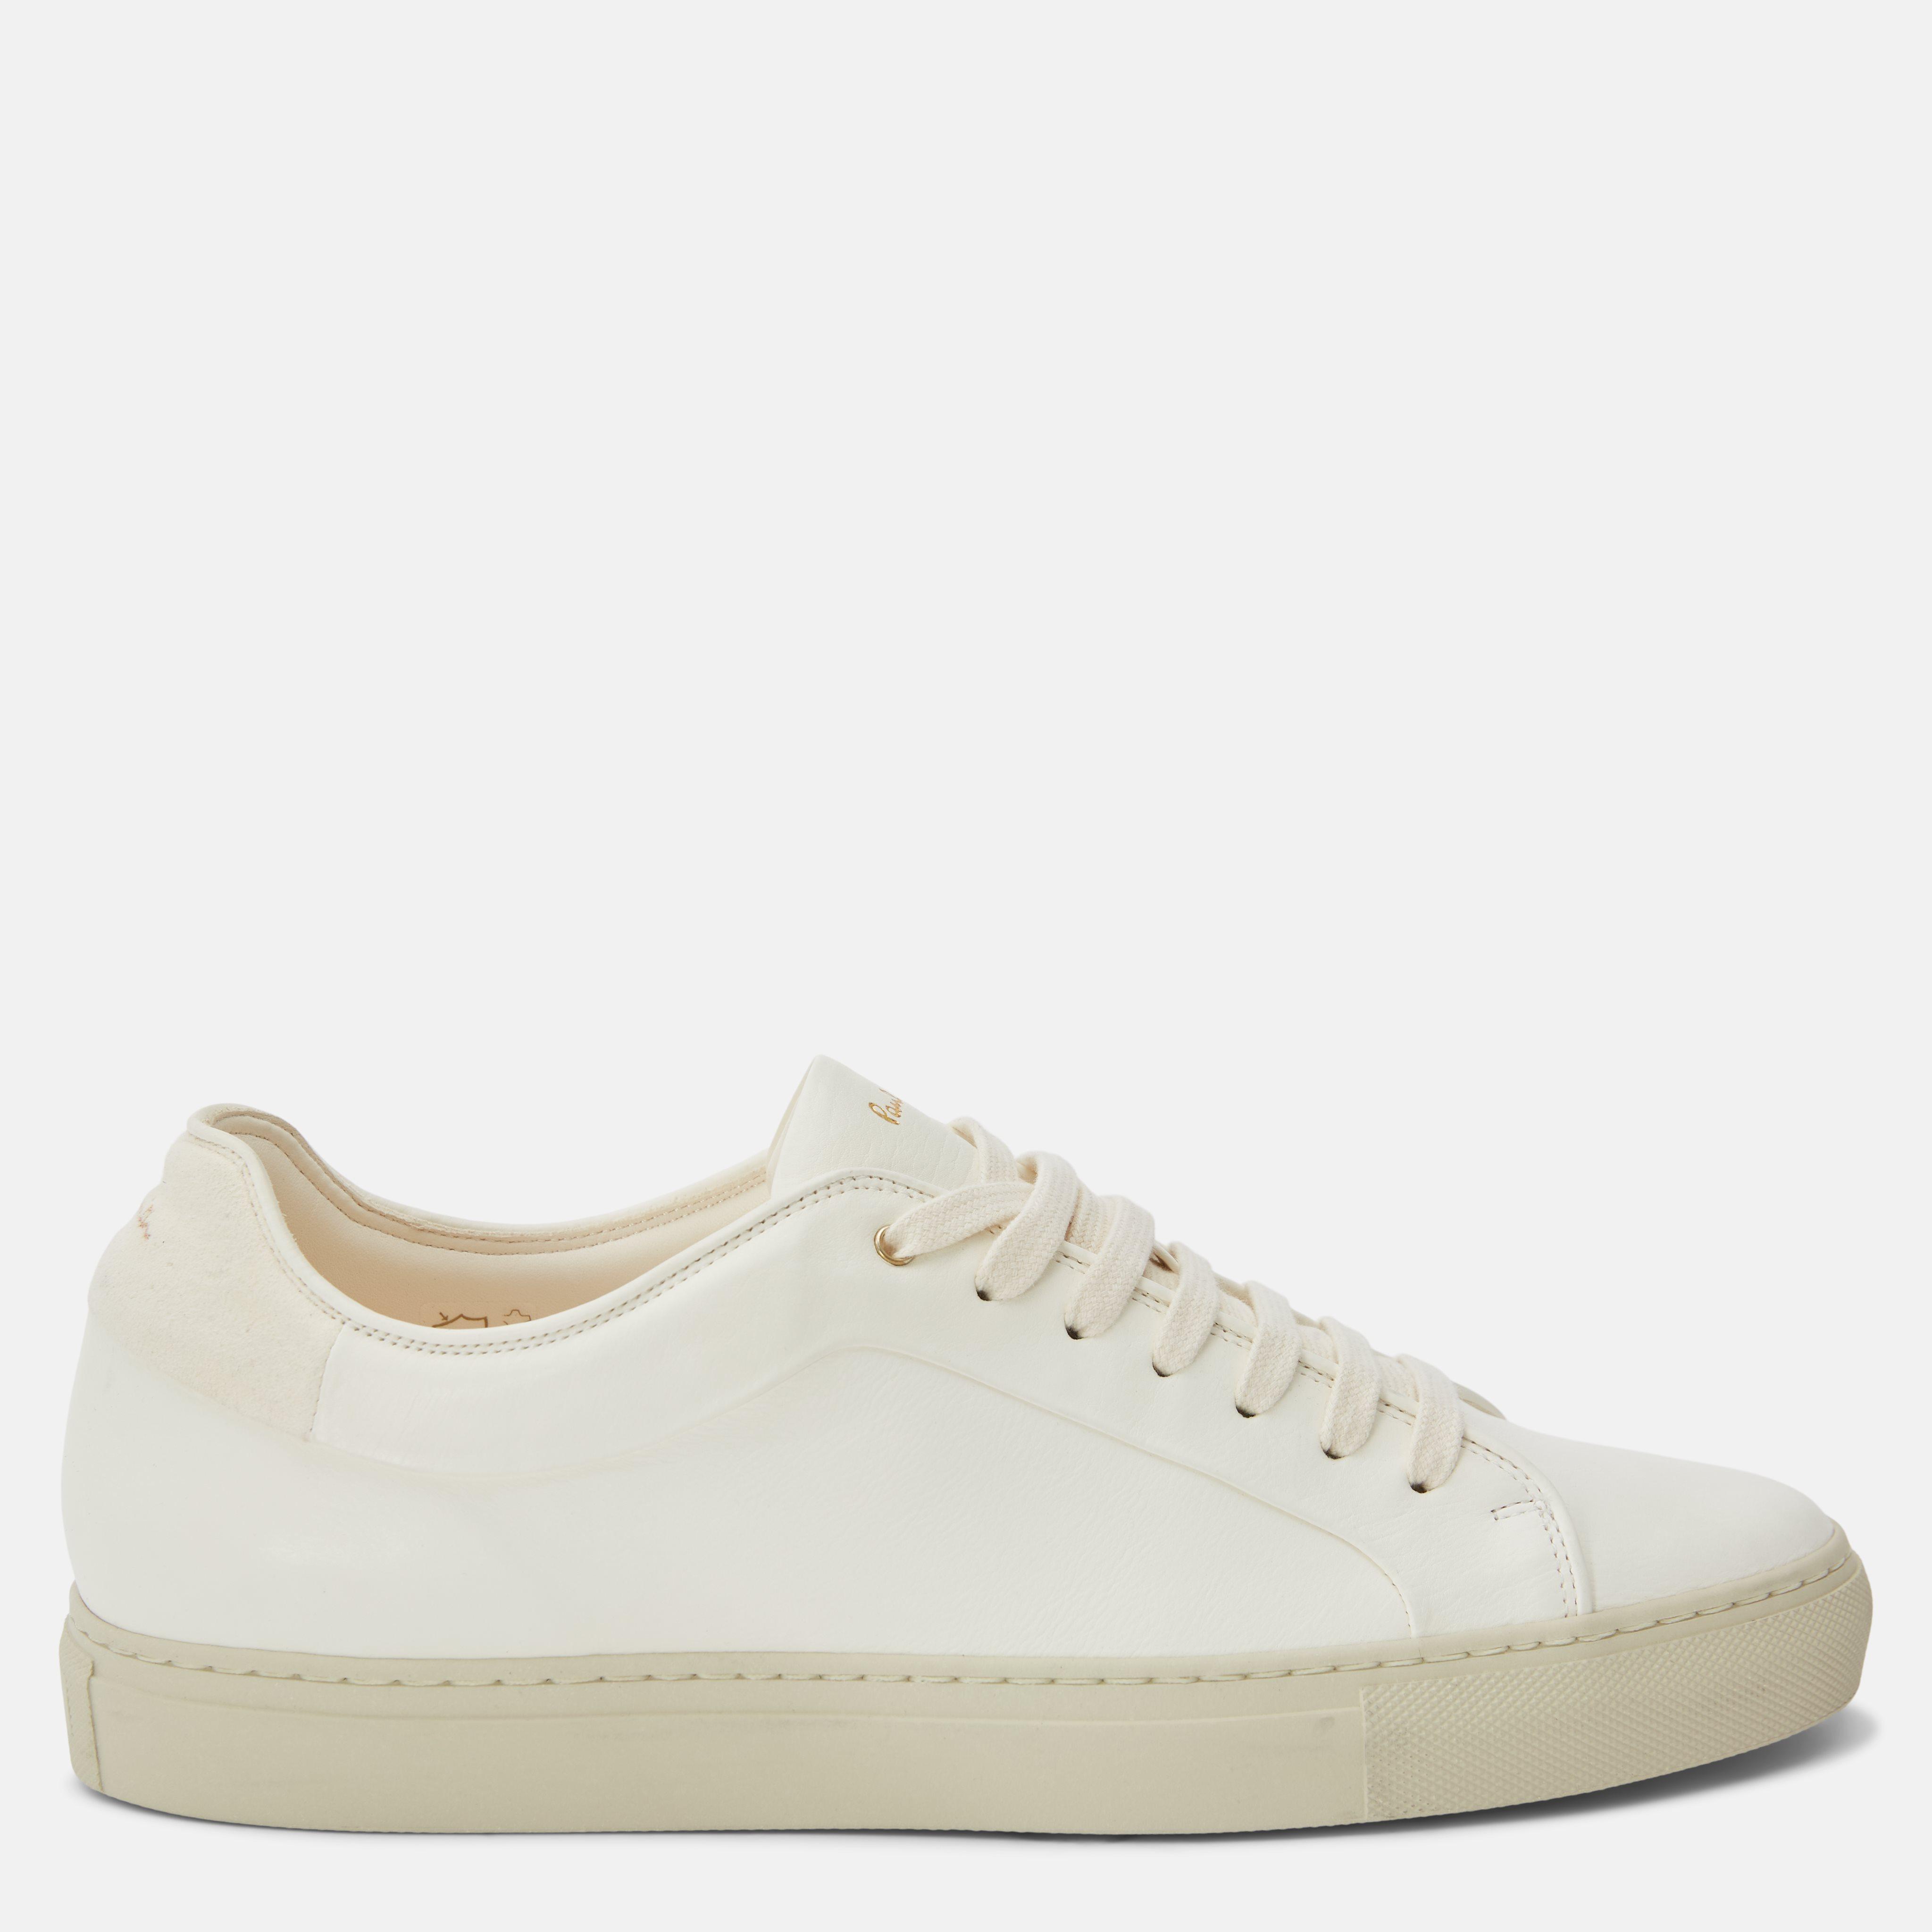 Basso Sneakers - Sko - Hvid